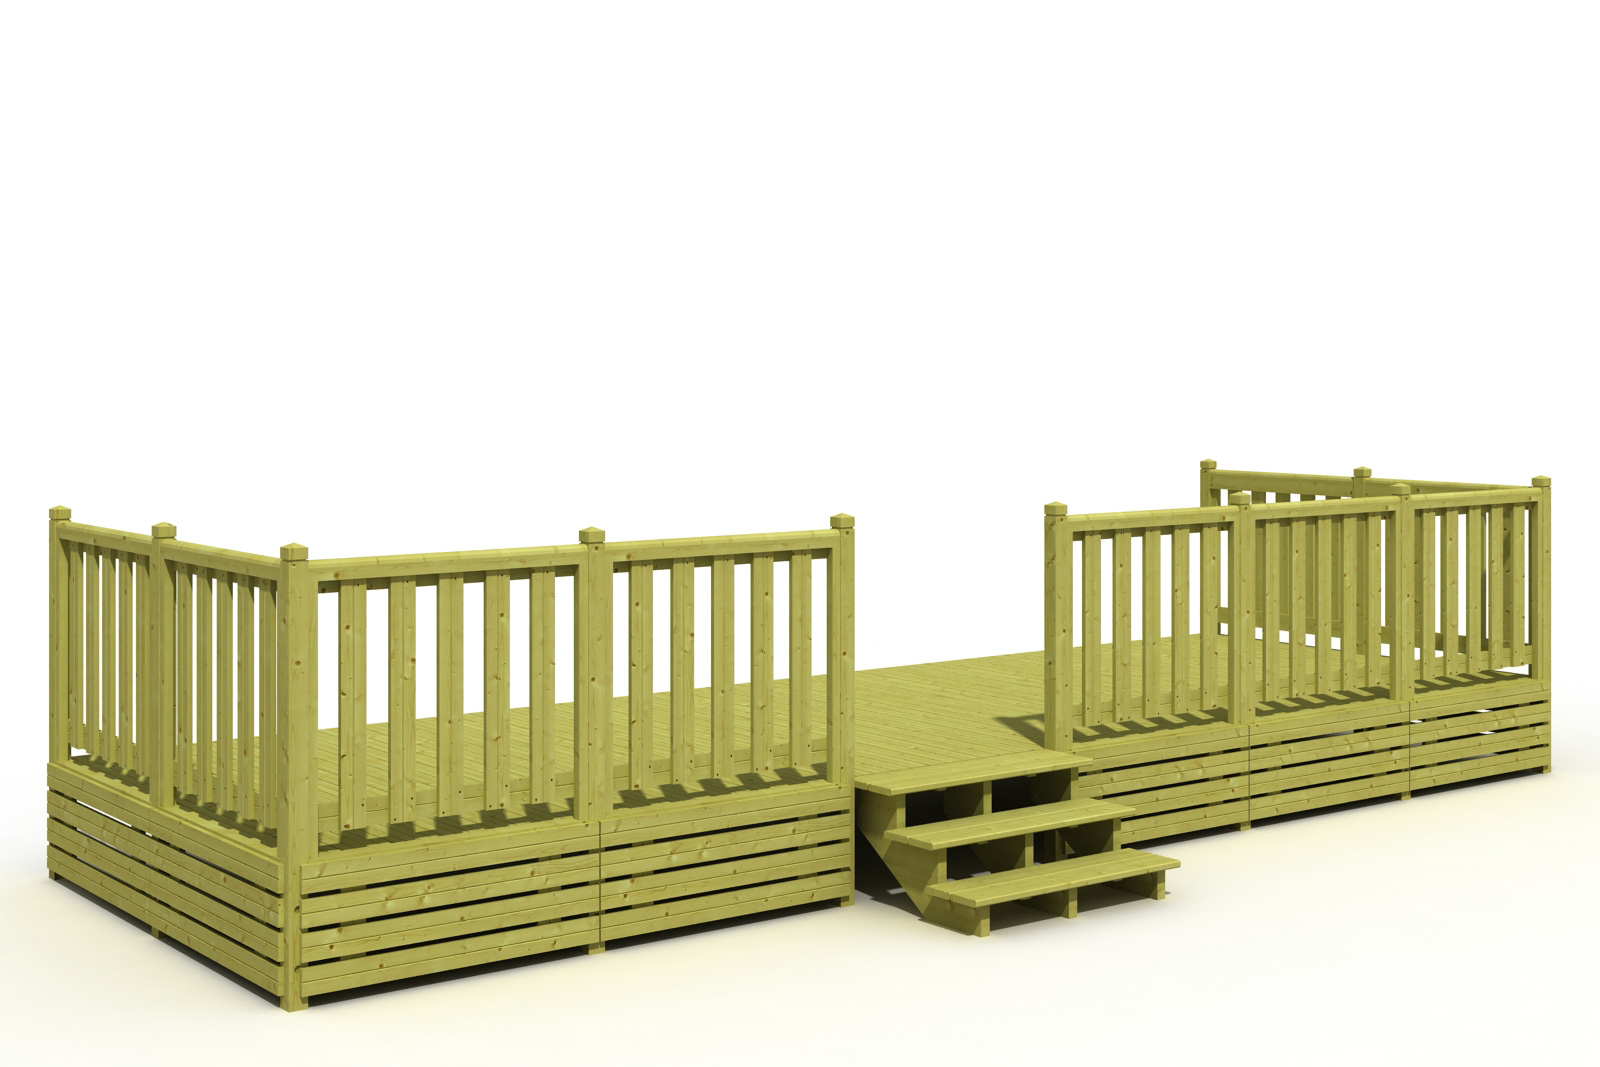 Terrasse mobil home 250×720 Terrasse Mobil Home Deckit Fabricant terrasses en bois pour  # Fabricant Mobil Home Bois